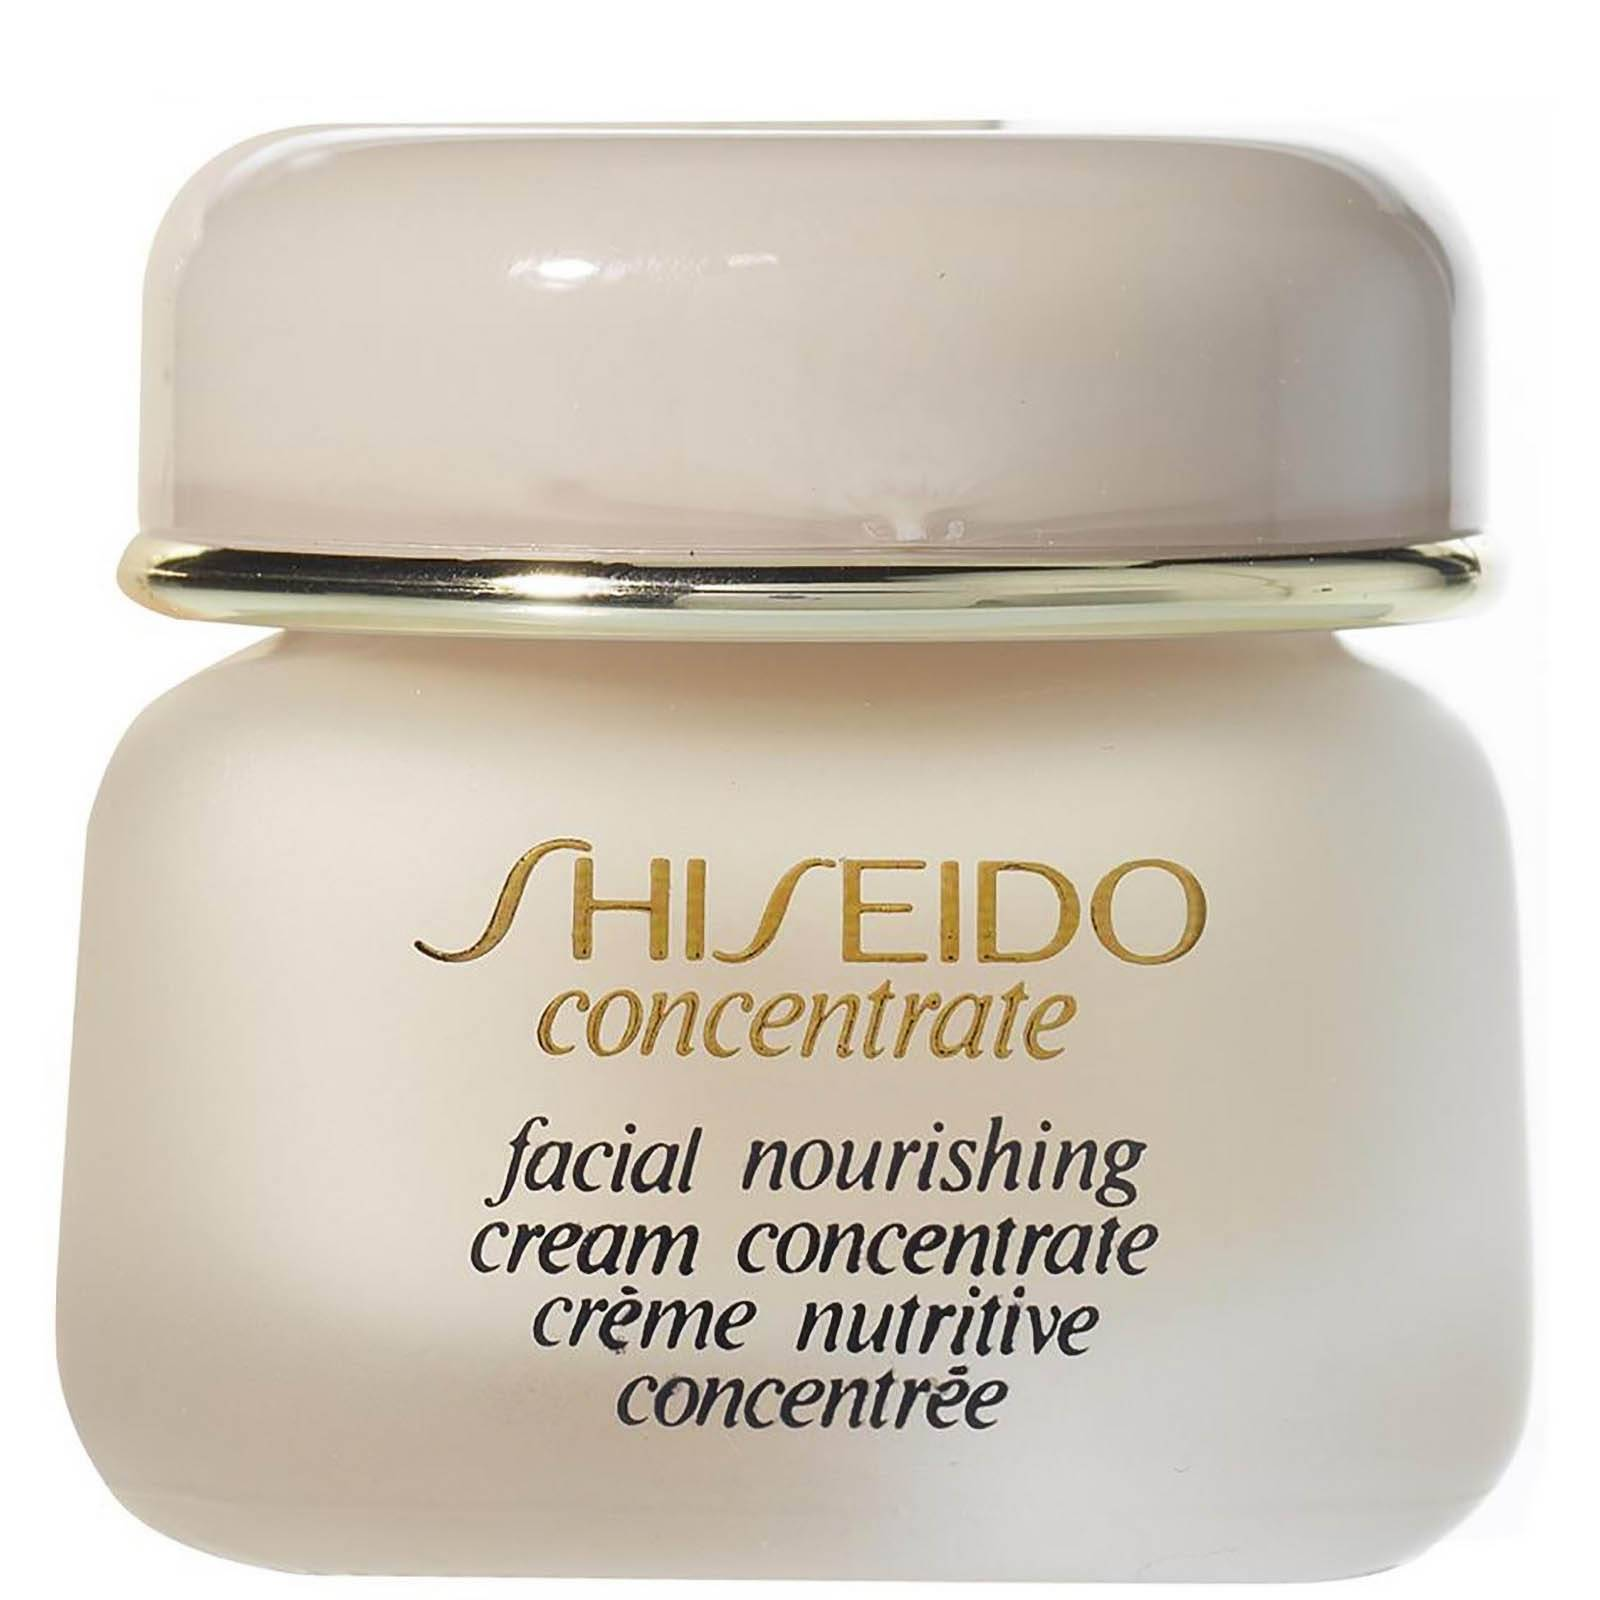 Shiseido Concentrate Crema nutriente viso concentrato 30ml/1 oz.